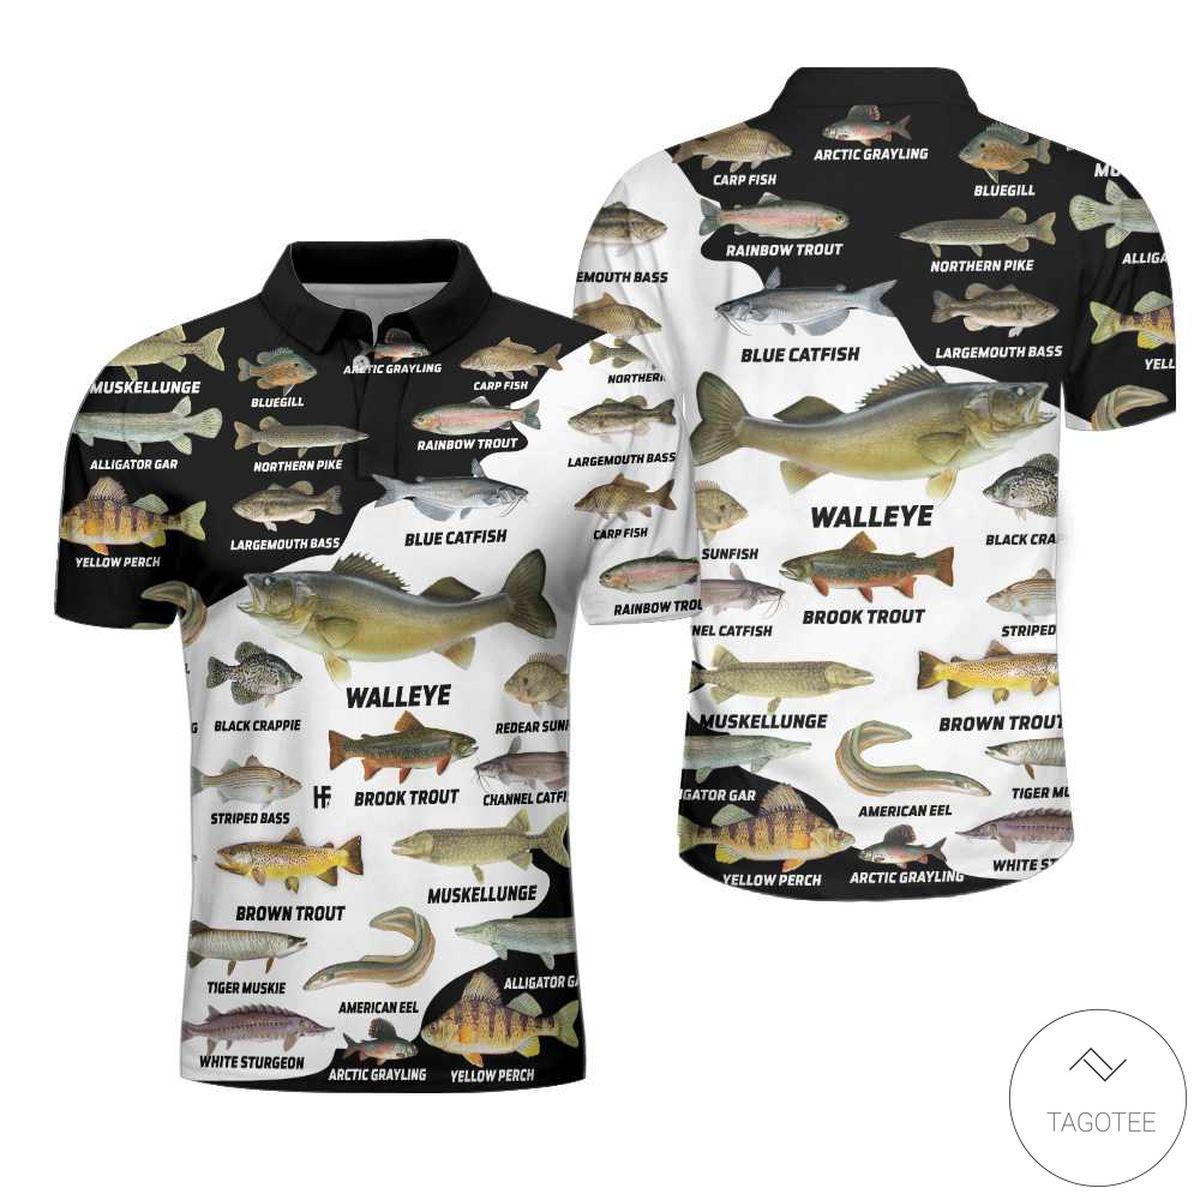 Freshwater Fish Types Polo Shirtx